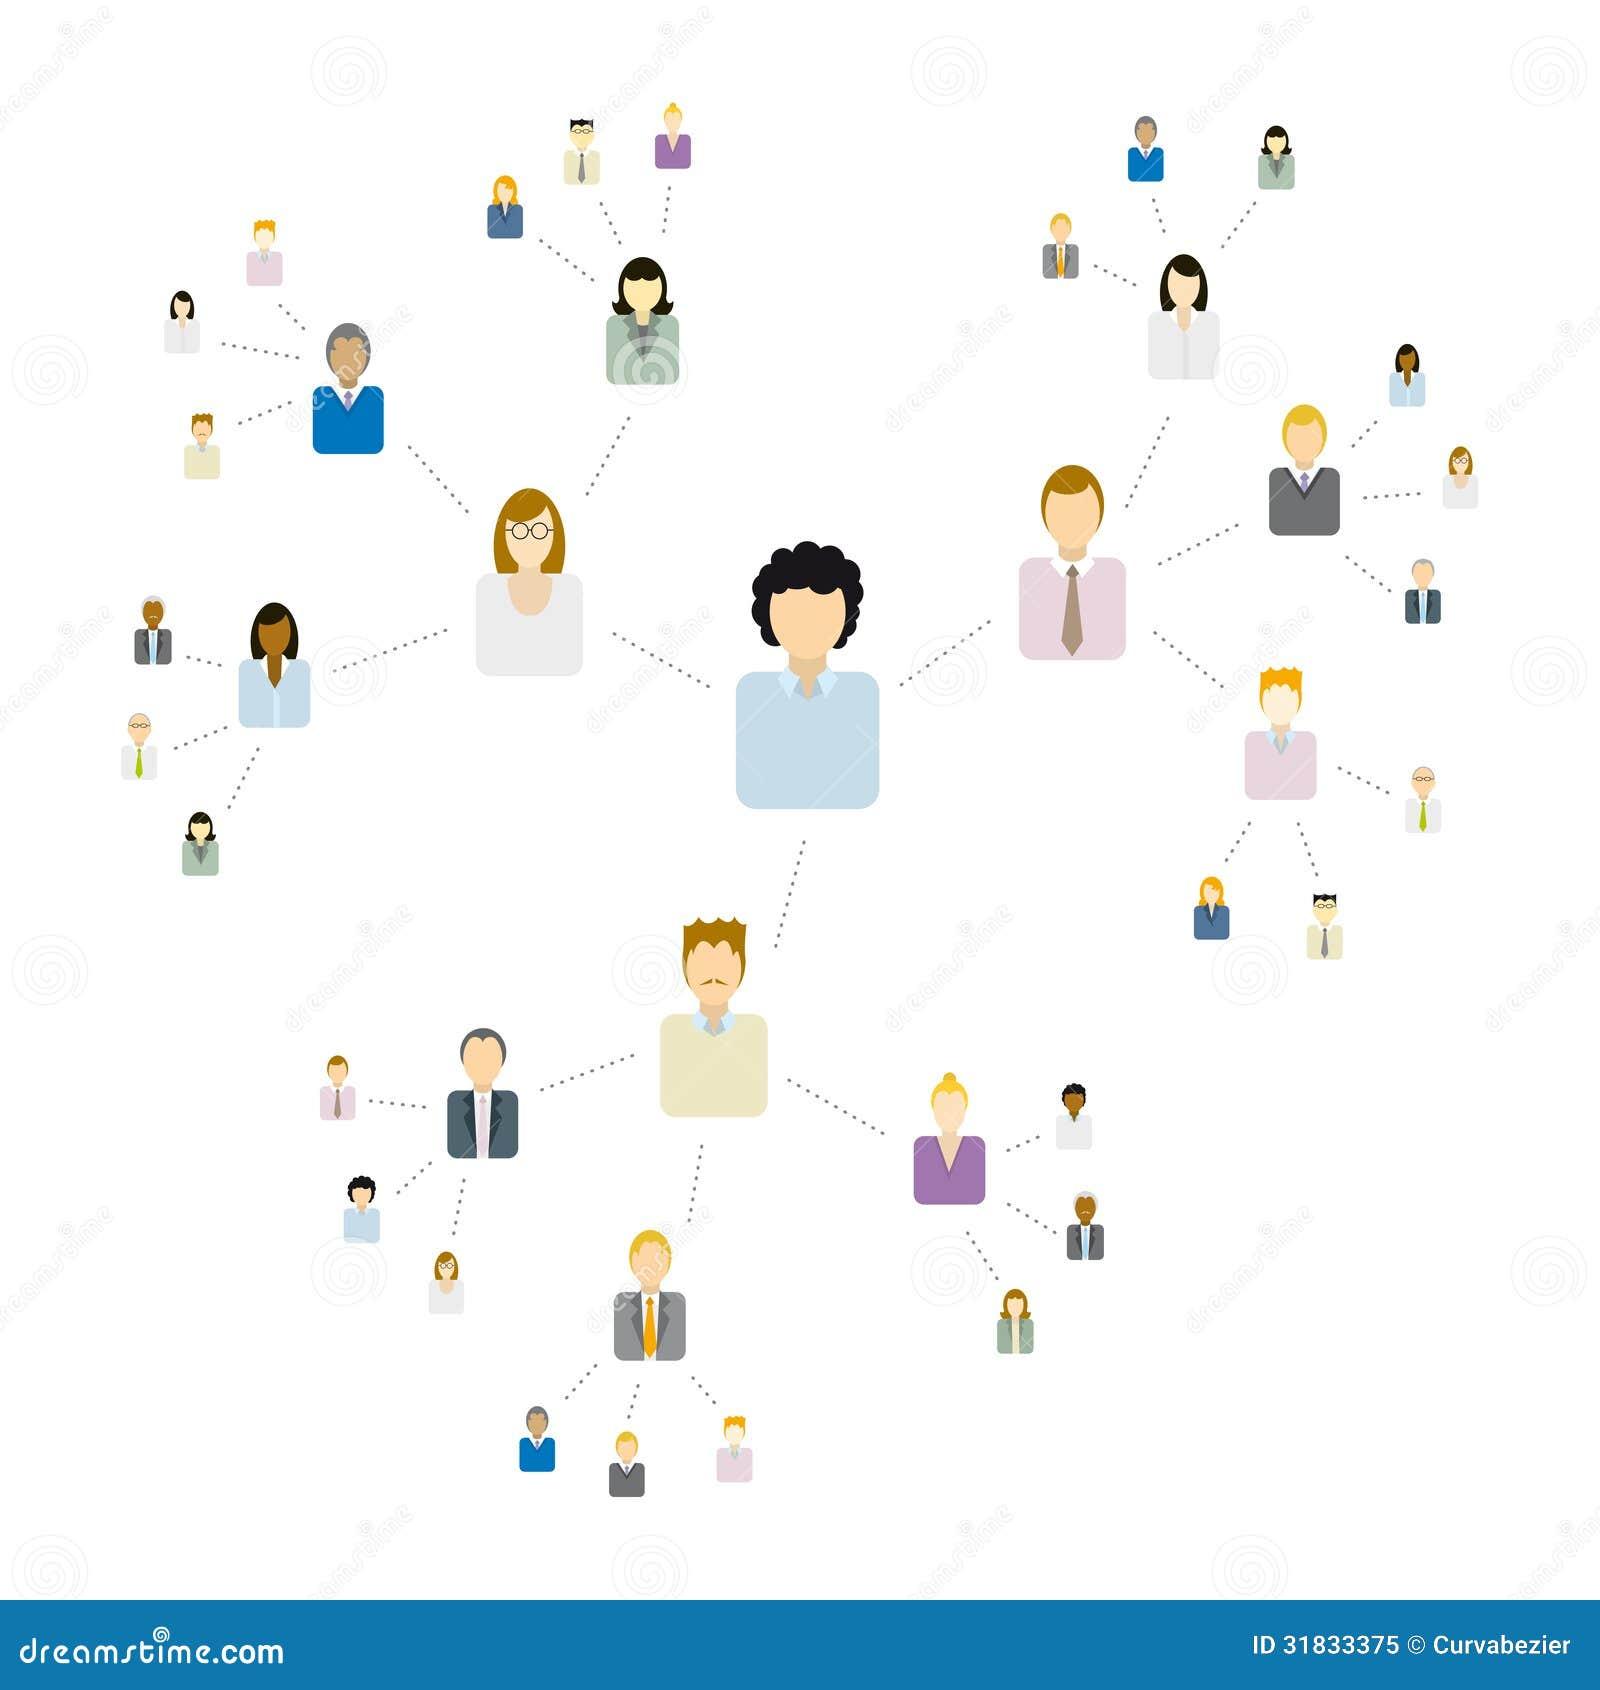 Viral Times Web: Viral Network / Communication Stock Illustration